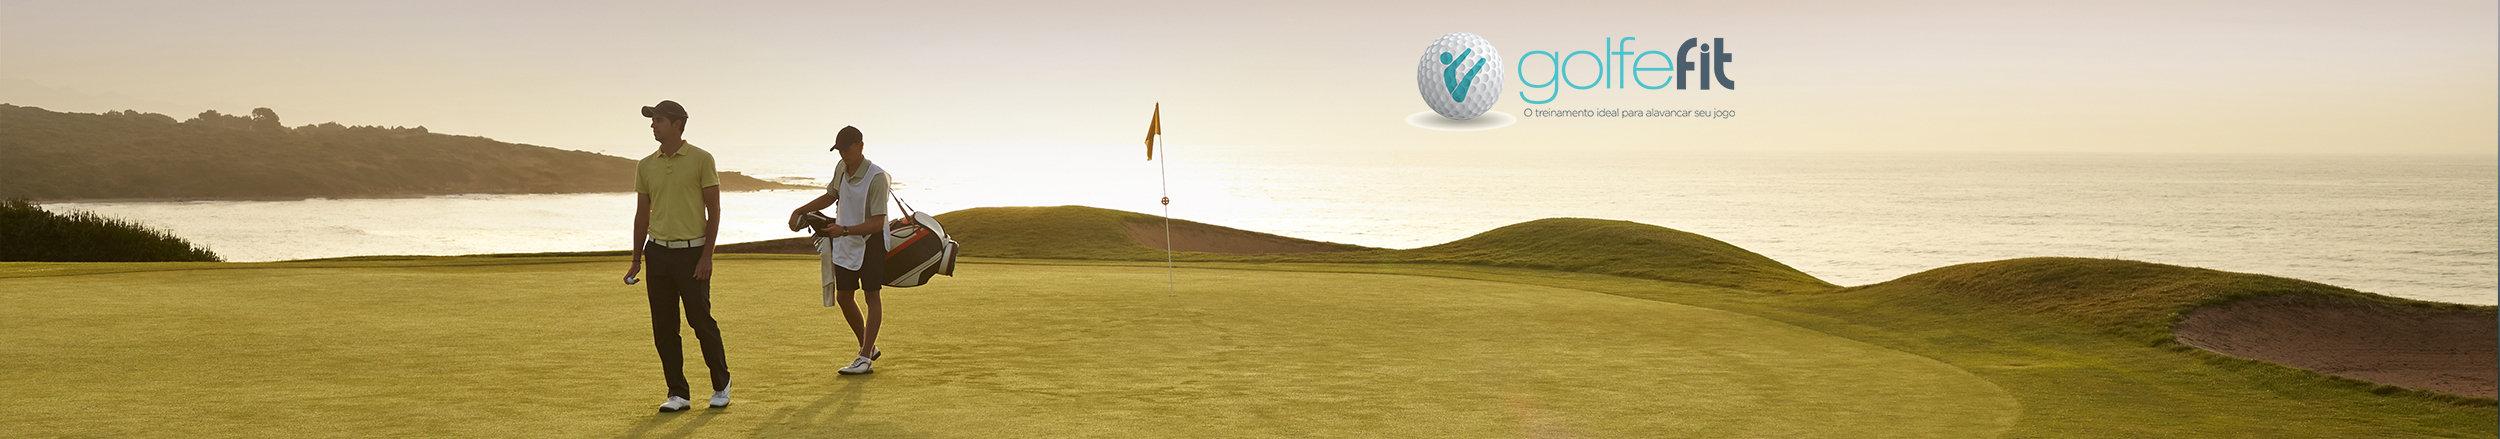 GolfeFit Banner No.2.jpg